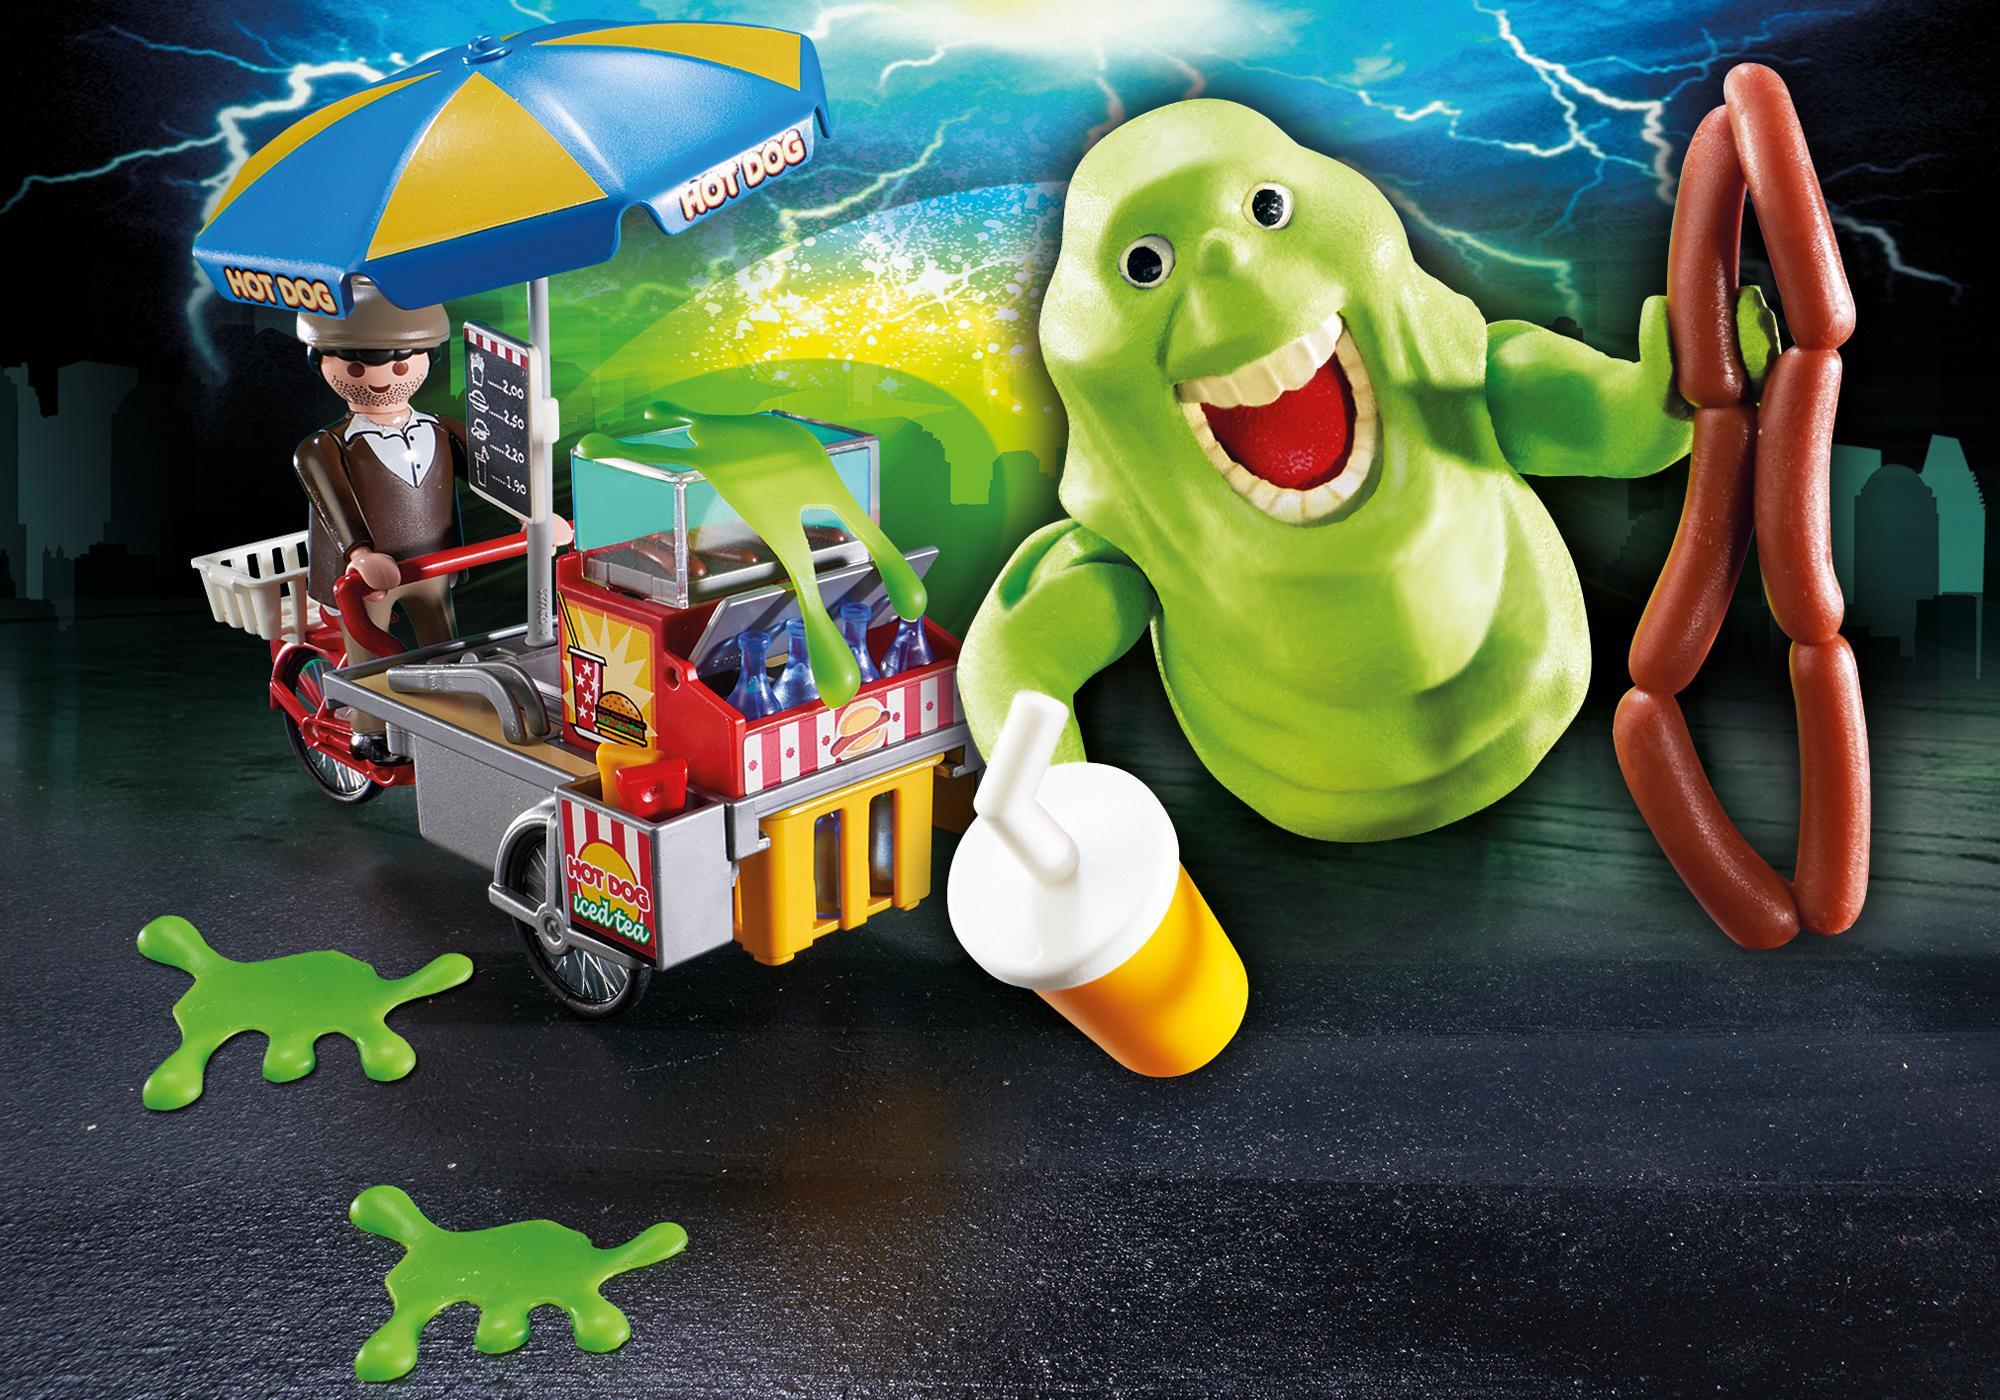 http://media.playmobil.com/i/playmobil/9222_product_extra1/Slimer przy budce z hotdogami